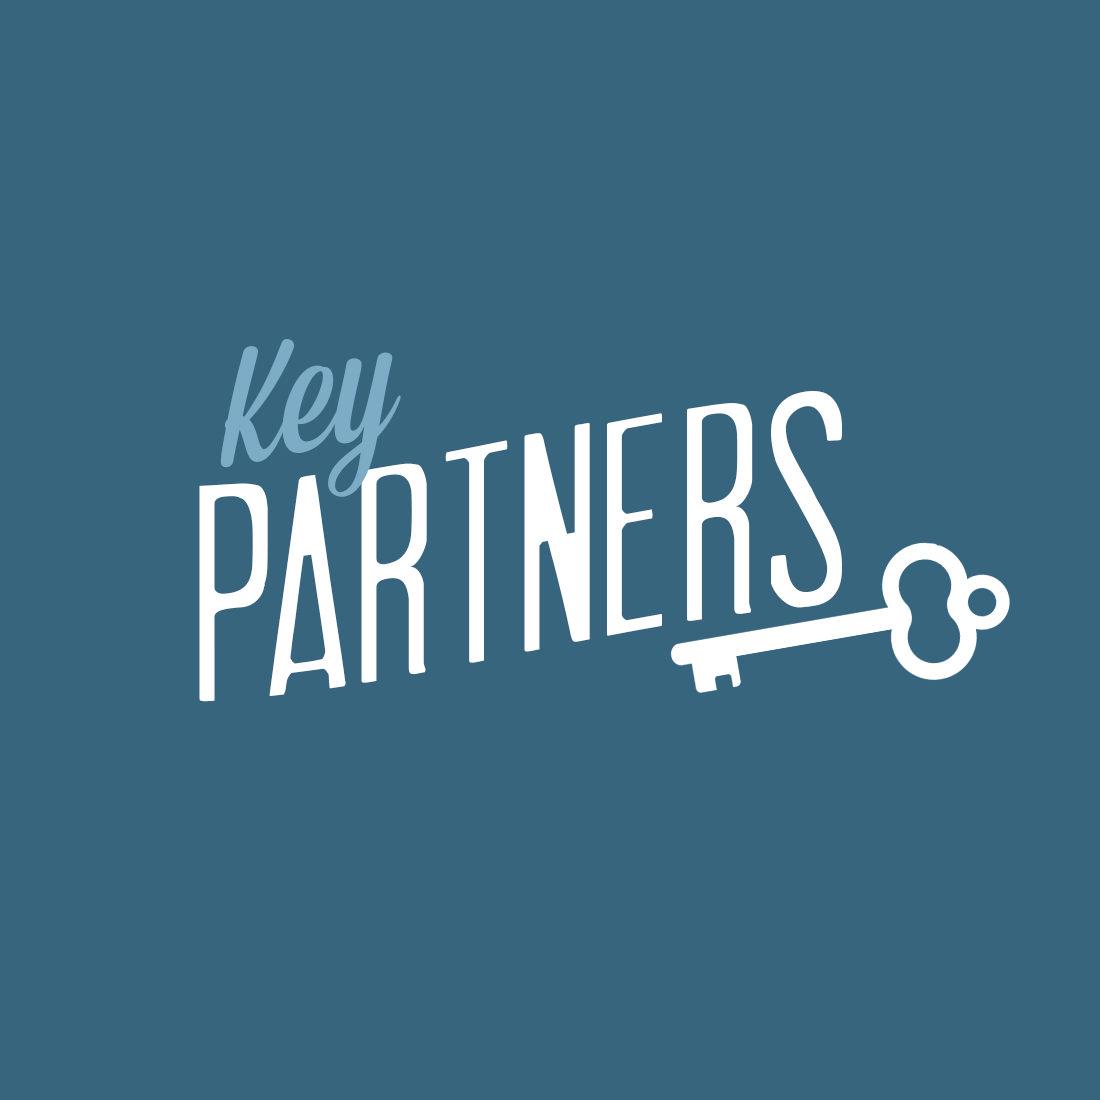 Key-partners